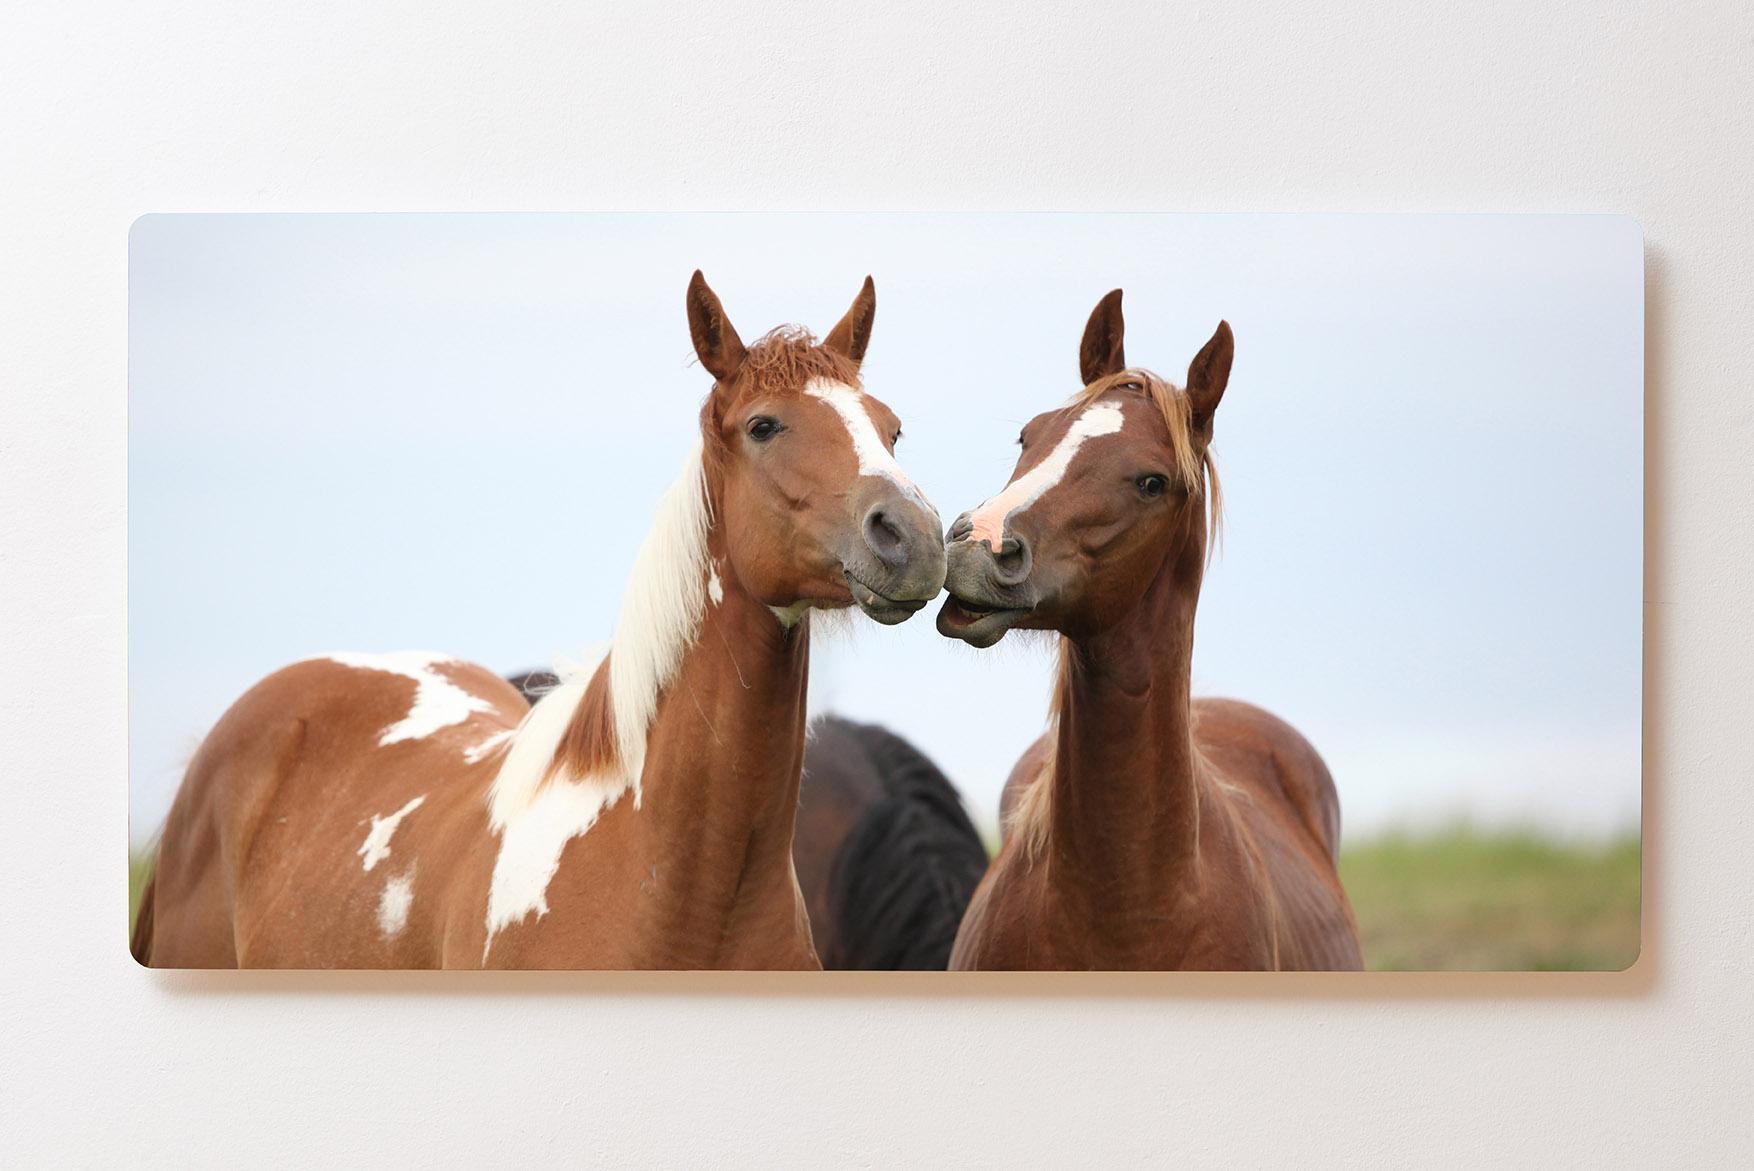 Magnettafel BACKLIGHT 120x60cm Motiv-Wandbild M102 Pferde